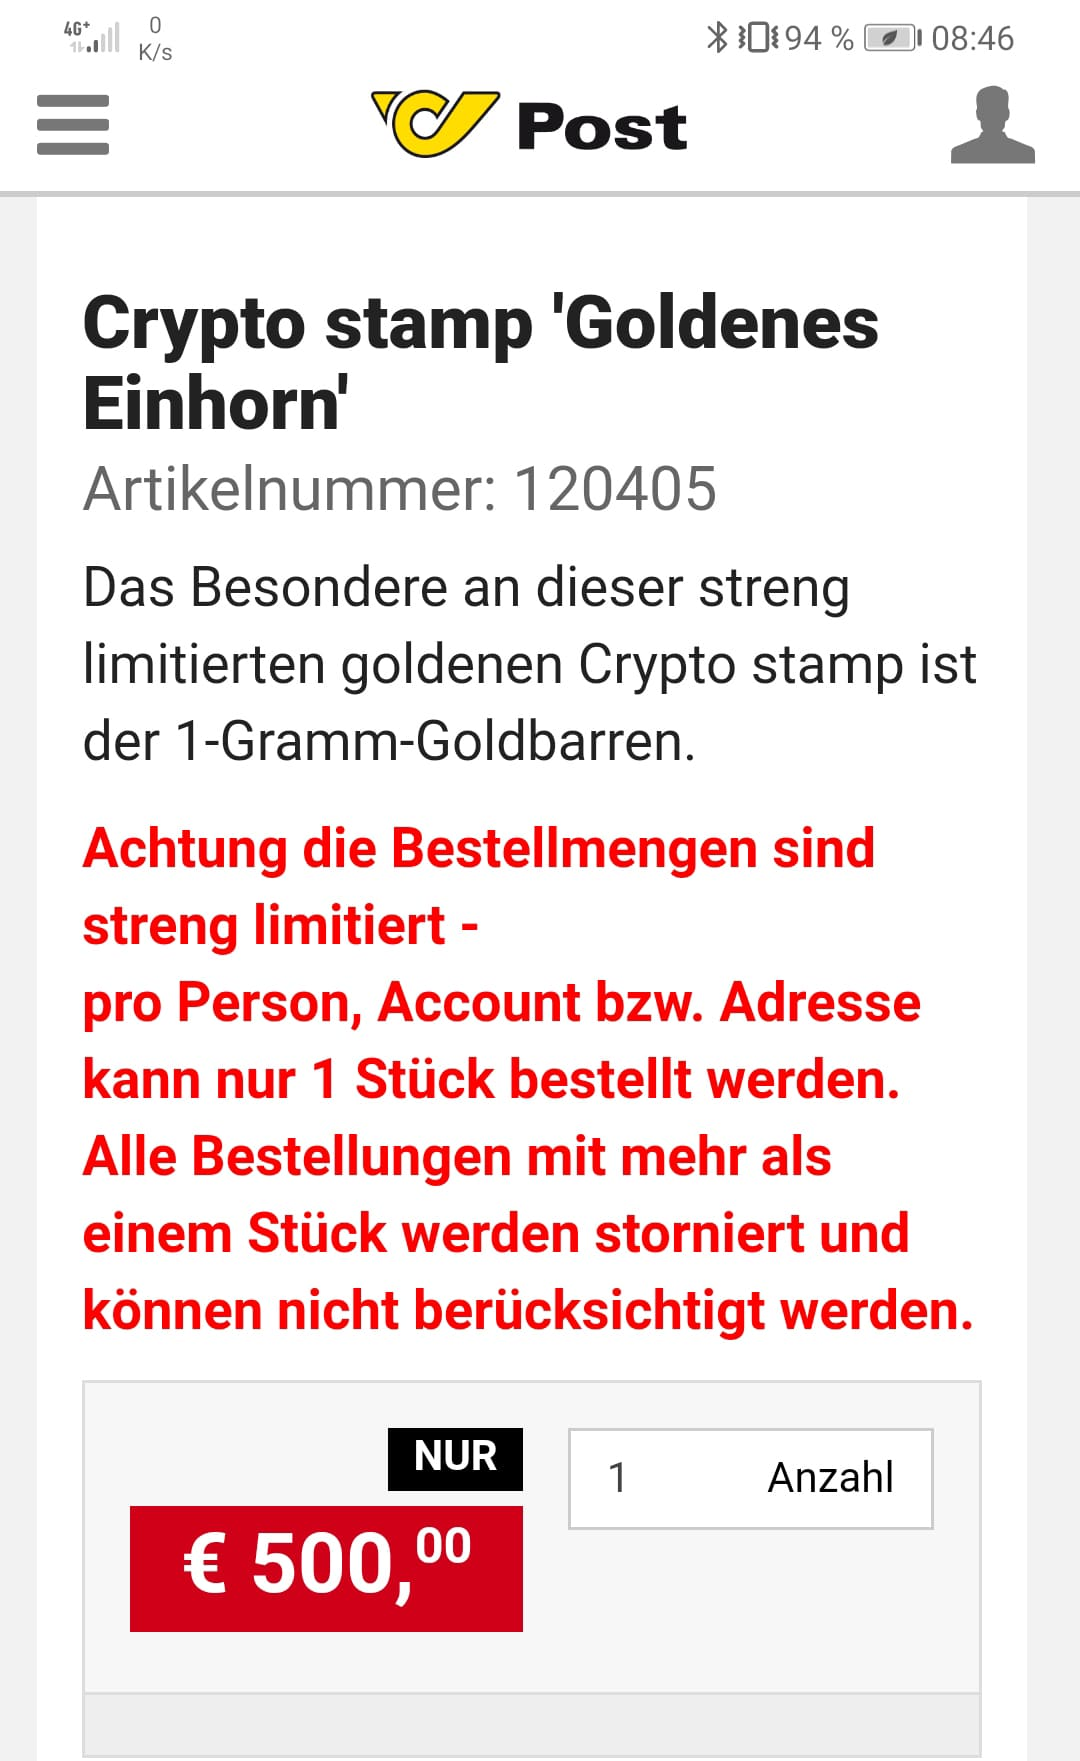 Goldene Einhorn Mock up gold Einhorn Crypto.stamp  - GEWINNSPIEL: Crypto Stamp 2.0 Goldenes Einhorn golden Unicorn